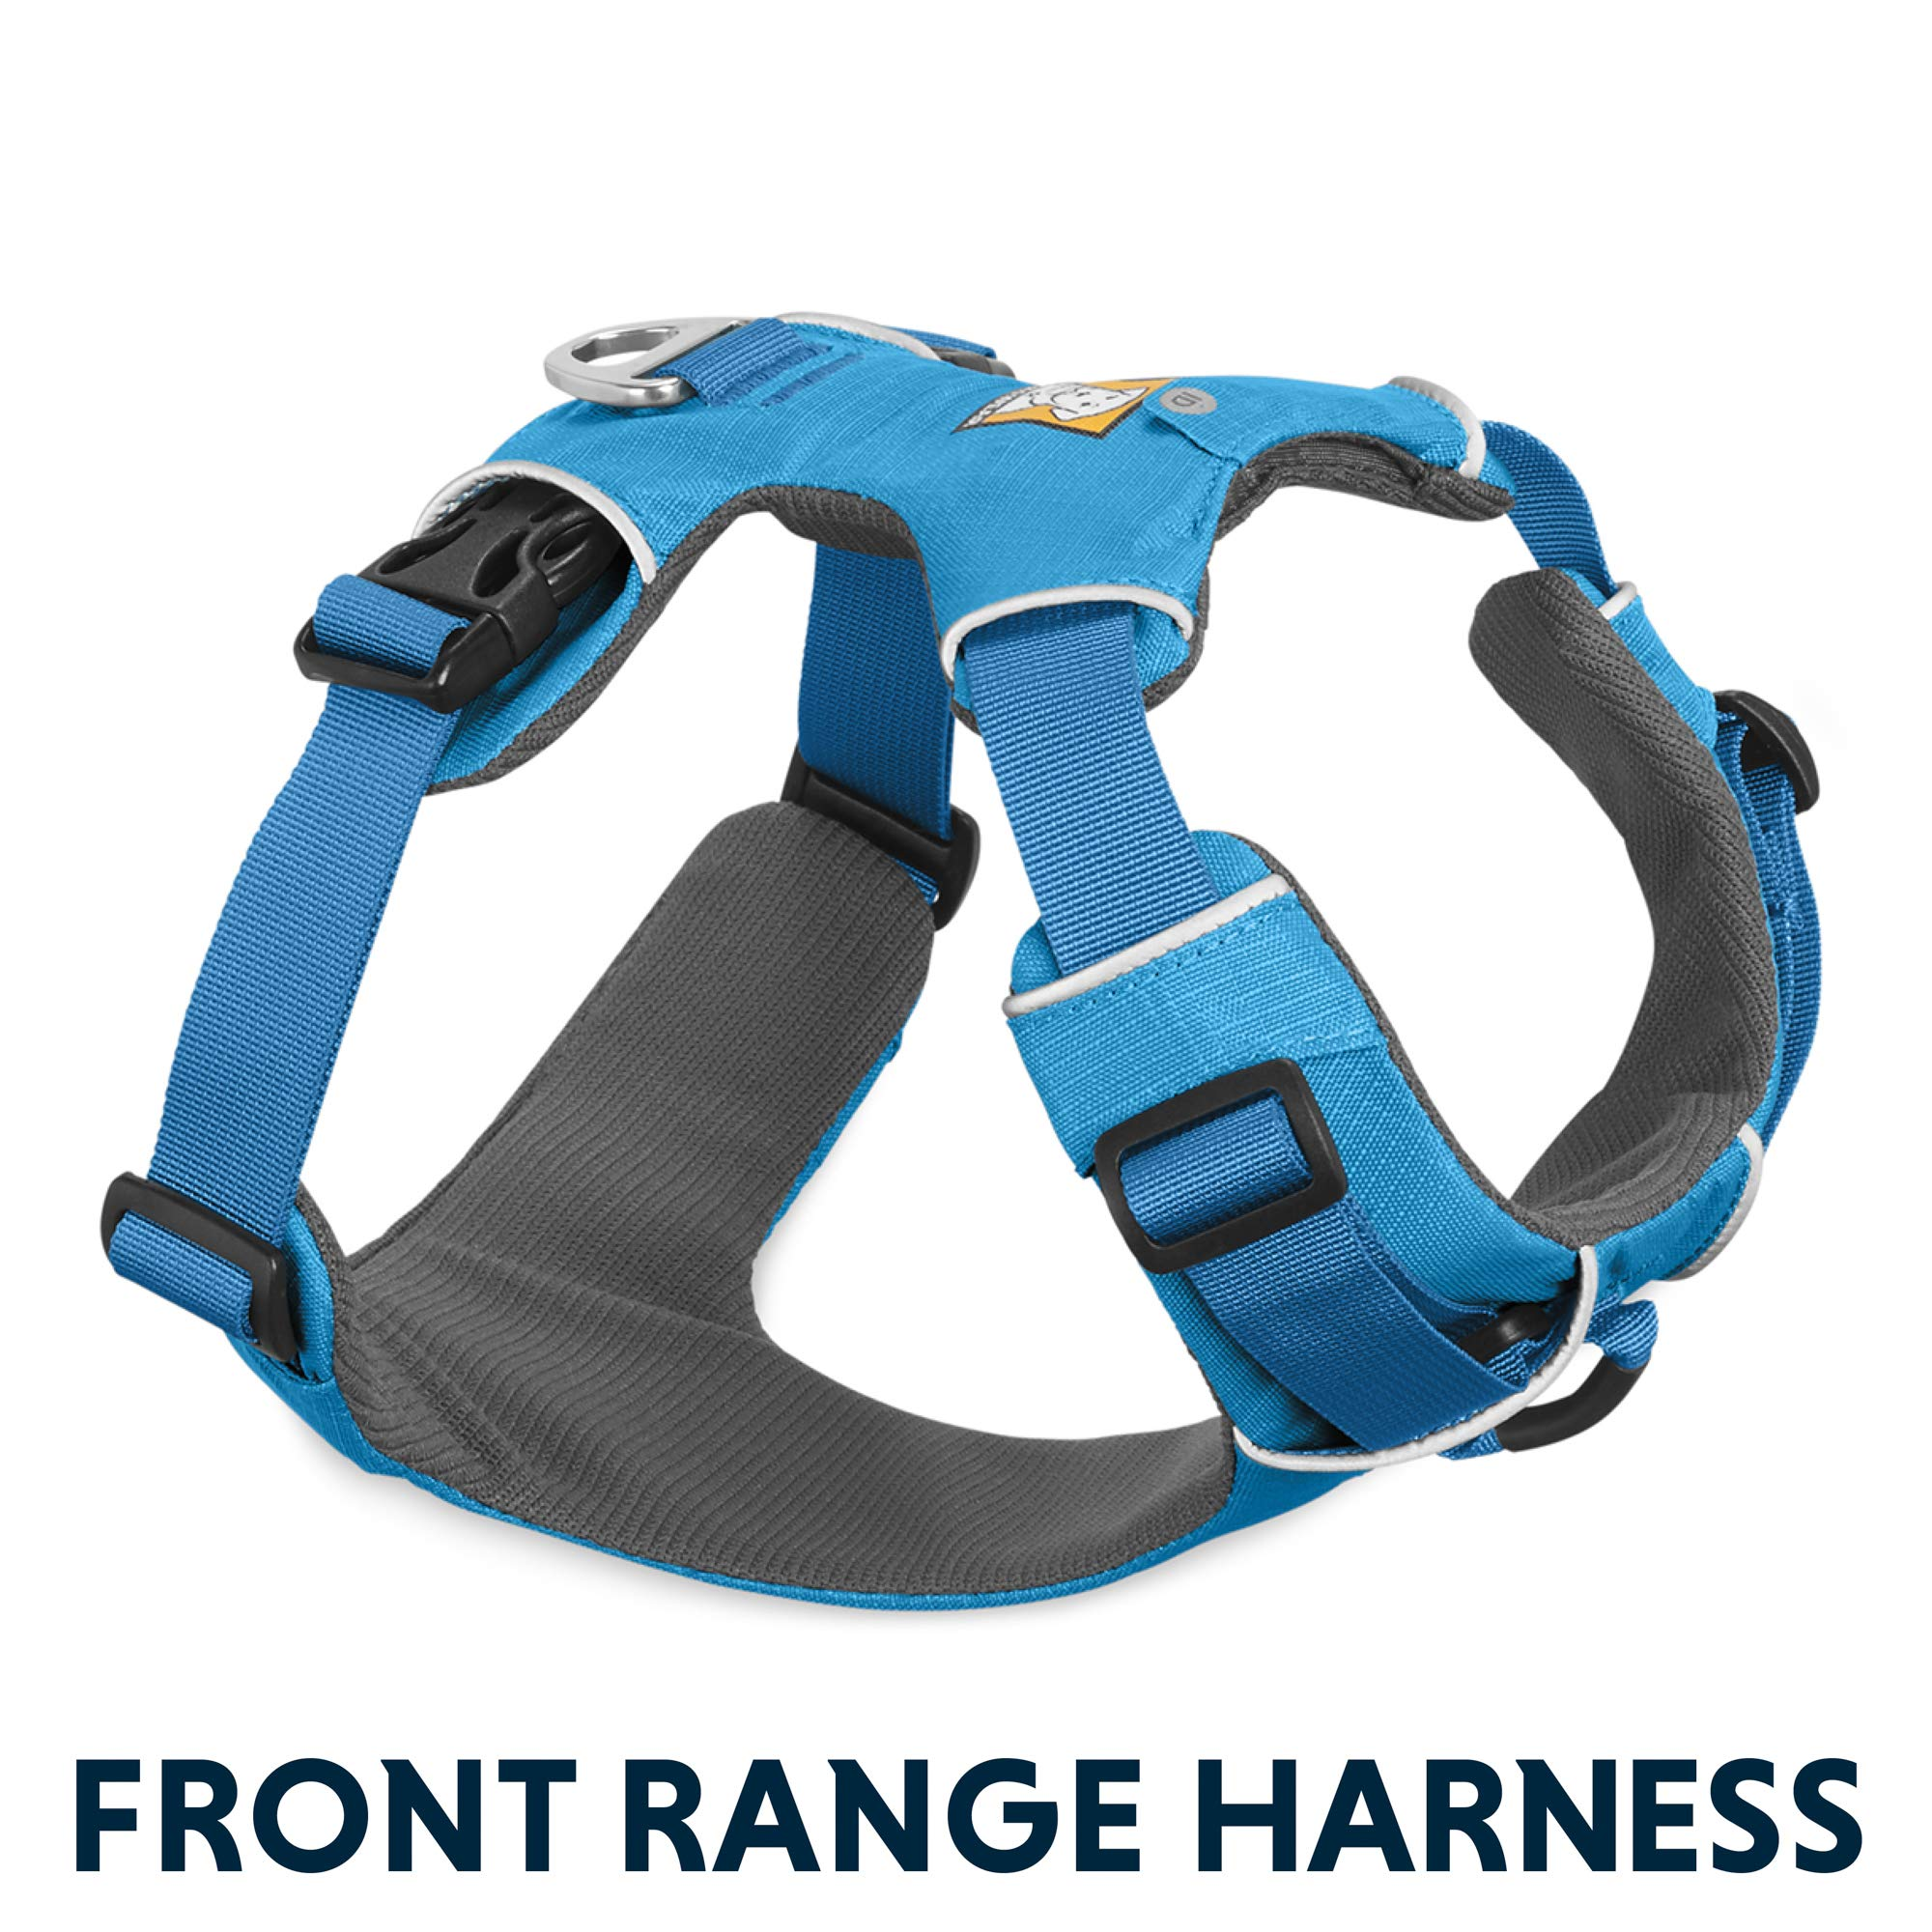 RUFFWEAR All Day Adventure Dog Harness, Medium Breeds, Adjustable Fit, Size: Medium, Blue Dusk, Front Range Harness, 30501-407M by RUFFWEAR